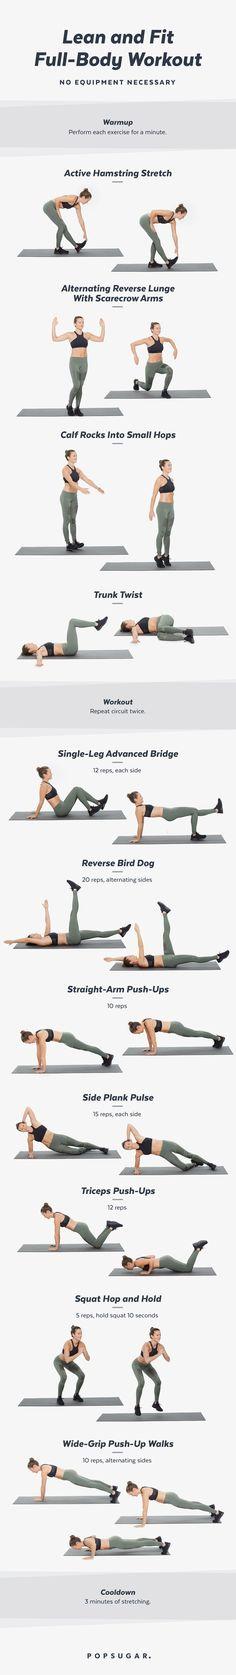 20-Minute Bodyweight Workout Video POPSUGAR Fitness